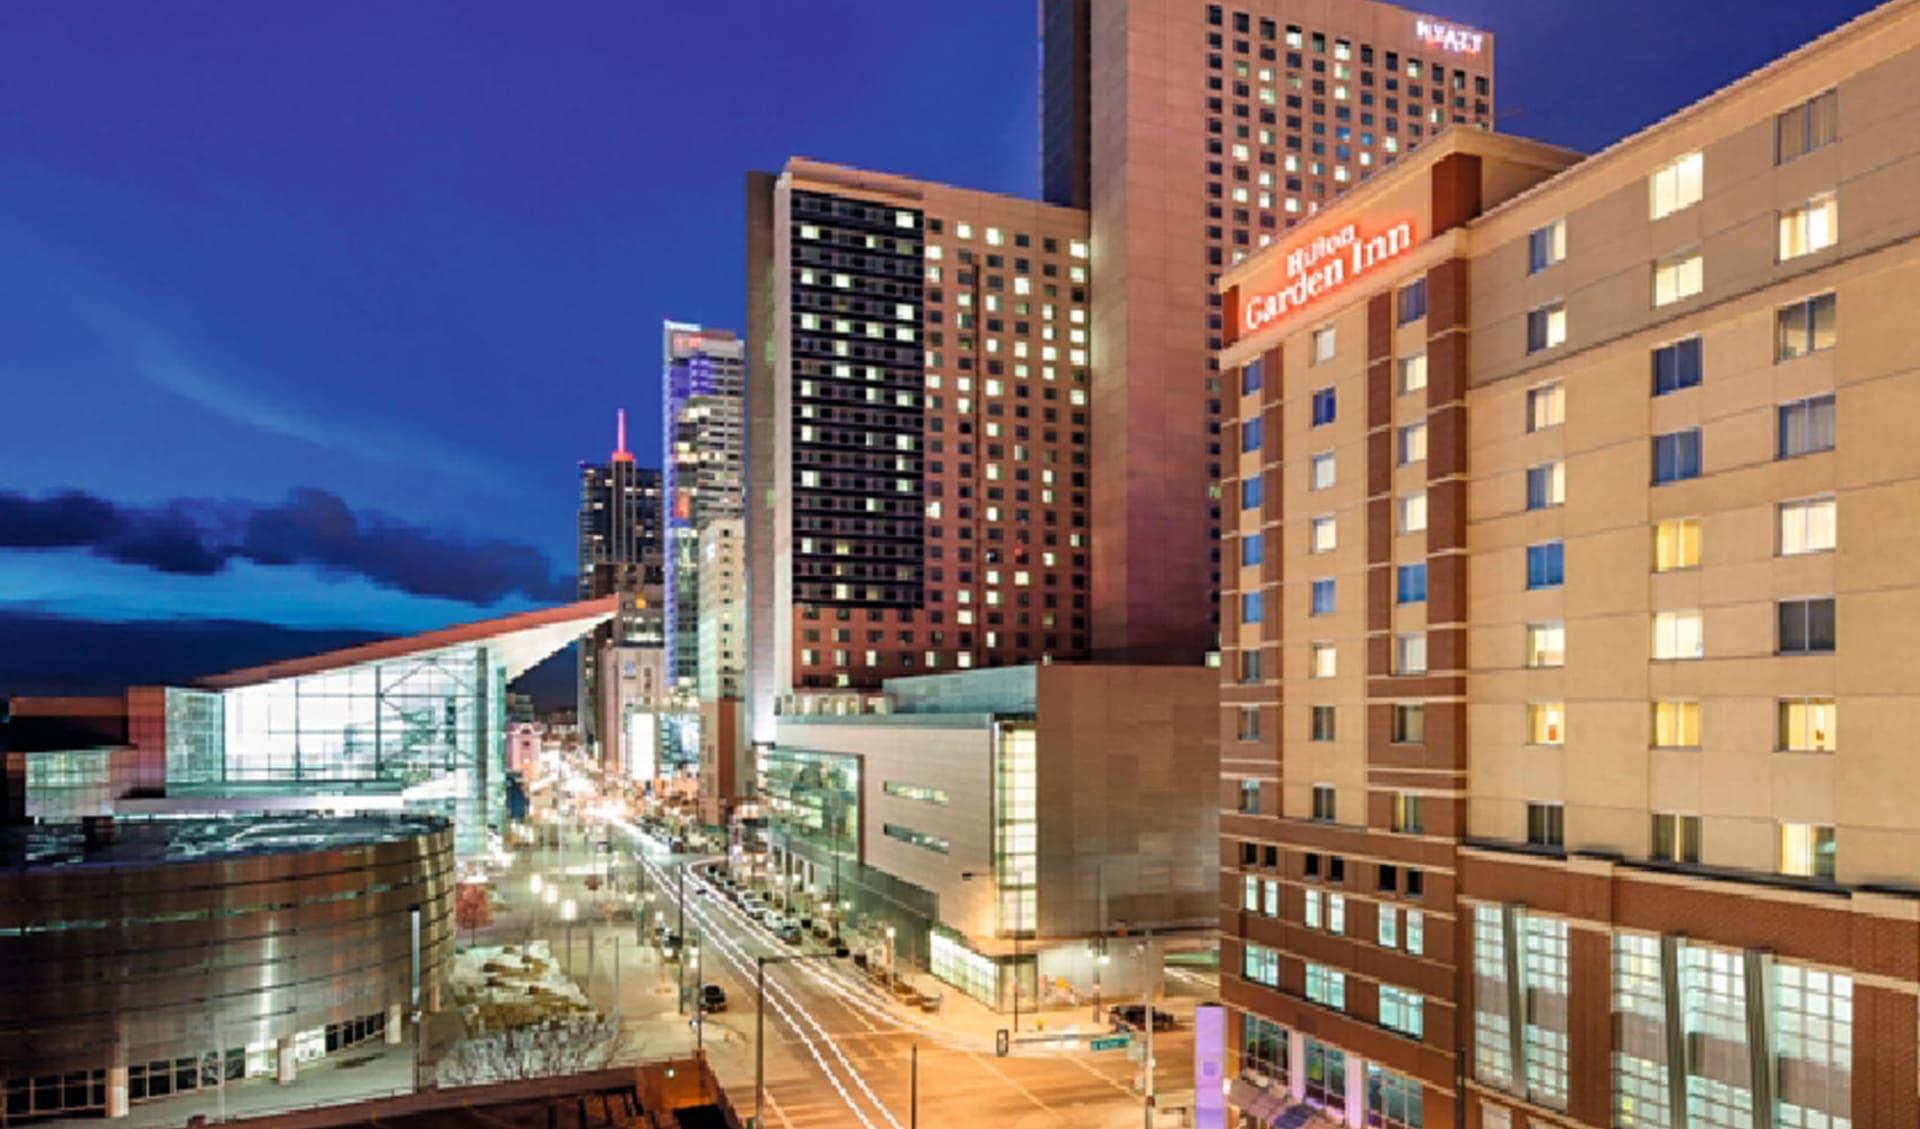 Hilton Garden Inn Denver Downtown:  Hilton Garden Inn Denver Downtown - Strassenansicht